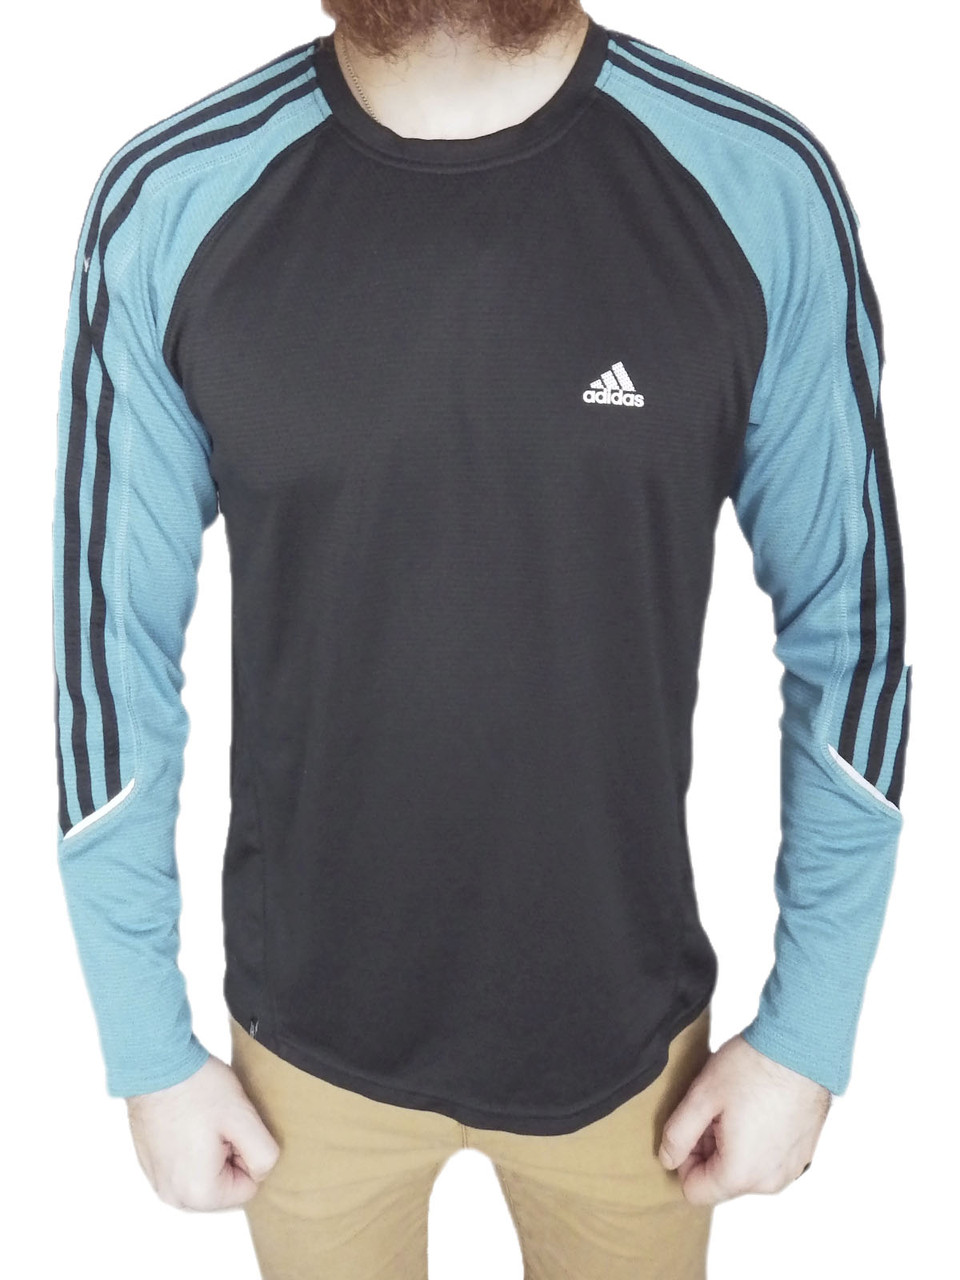 3735bf2fb296 Купить Кофта Adidas р-р L (сток, б у) мужская спортивная водолазка ...